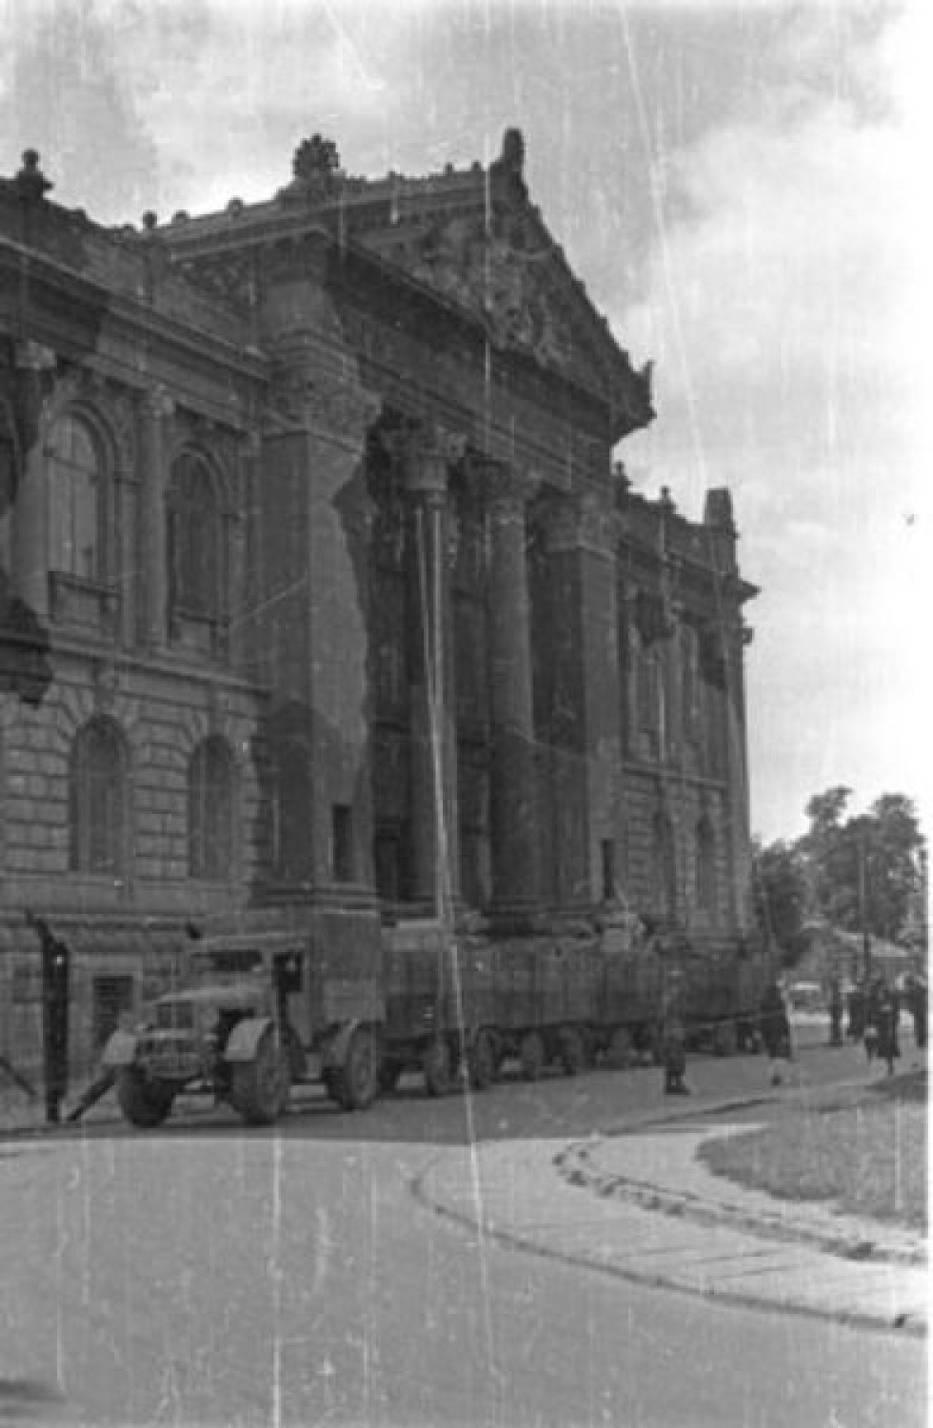 Lipiec 1944, Zachęta